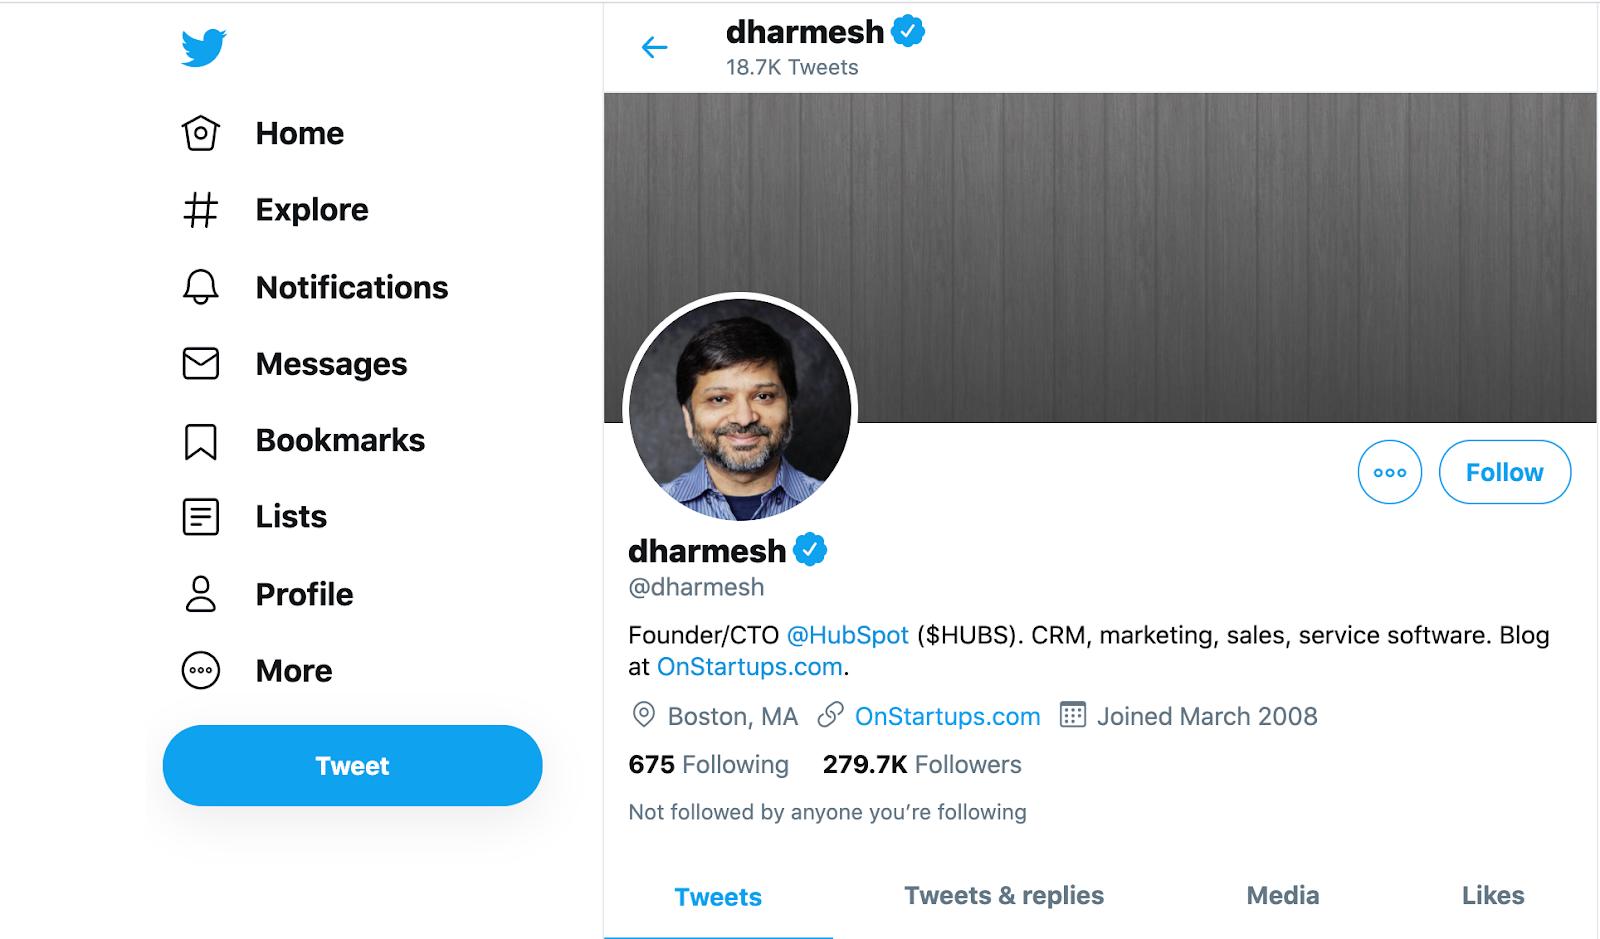 dharmesh twitter bio